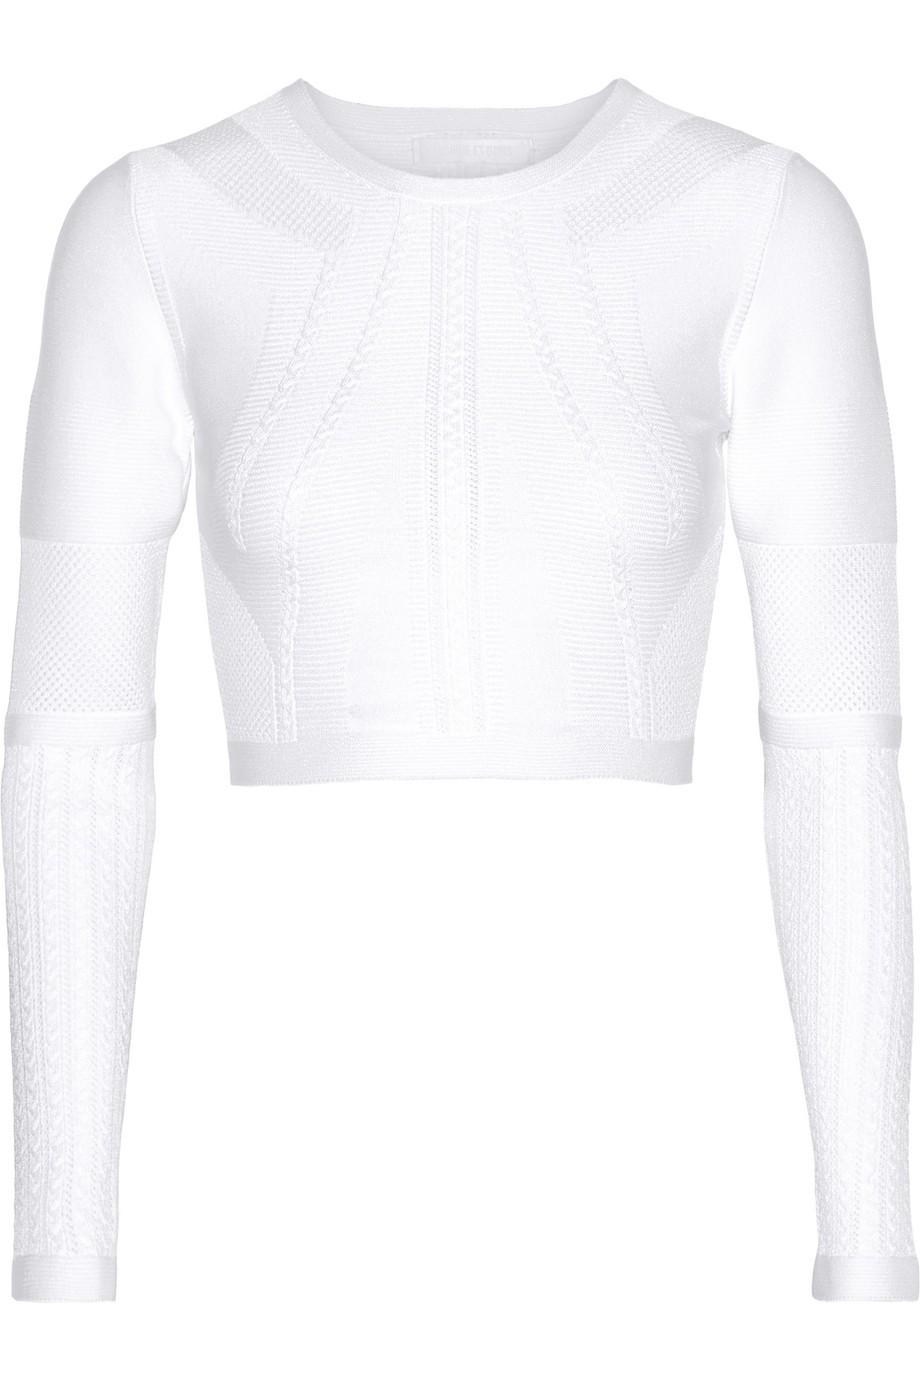 Cushnie Et Ochs Cropped Stretch-Knit Top, White, Women's, Size: XS